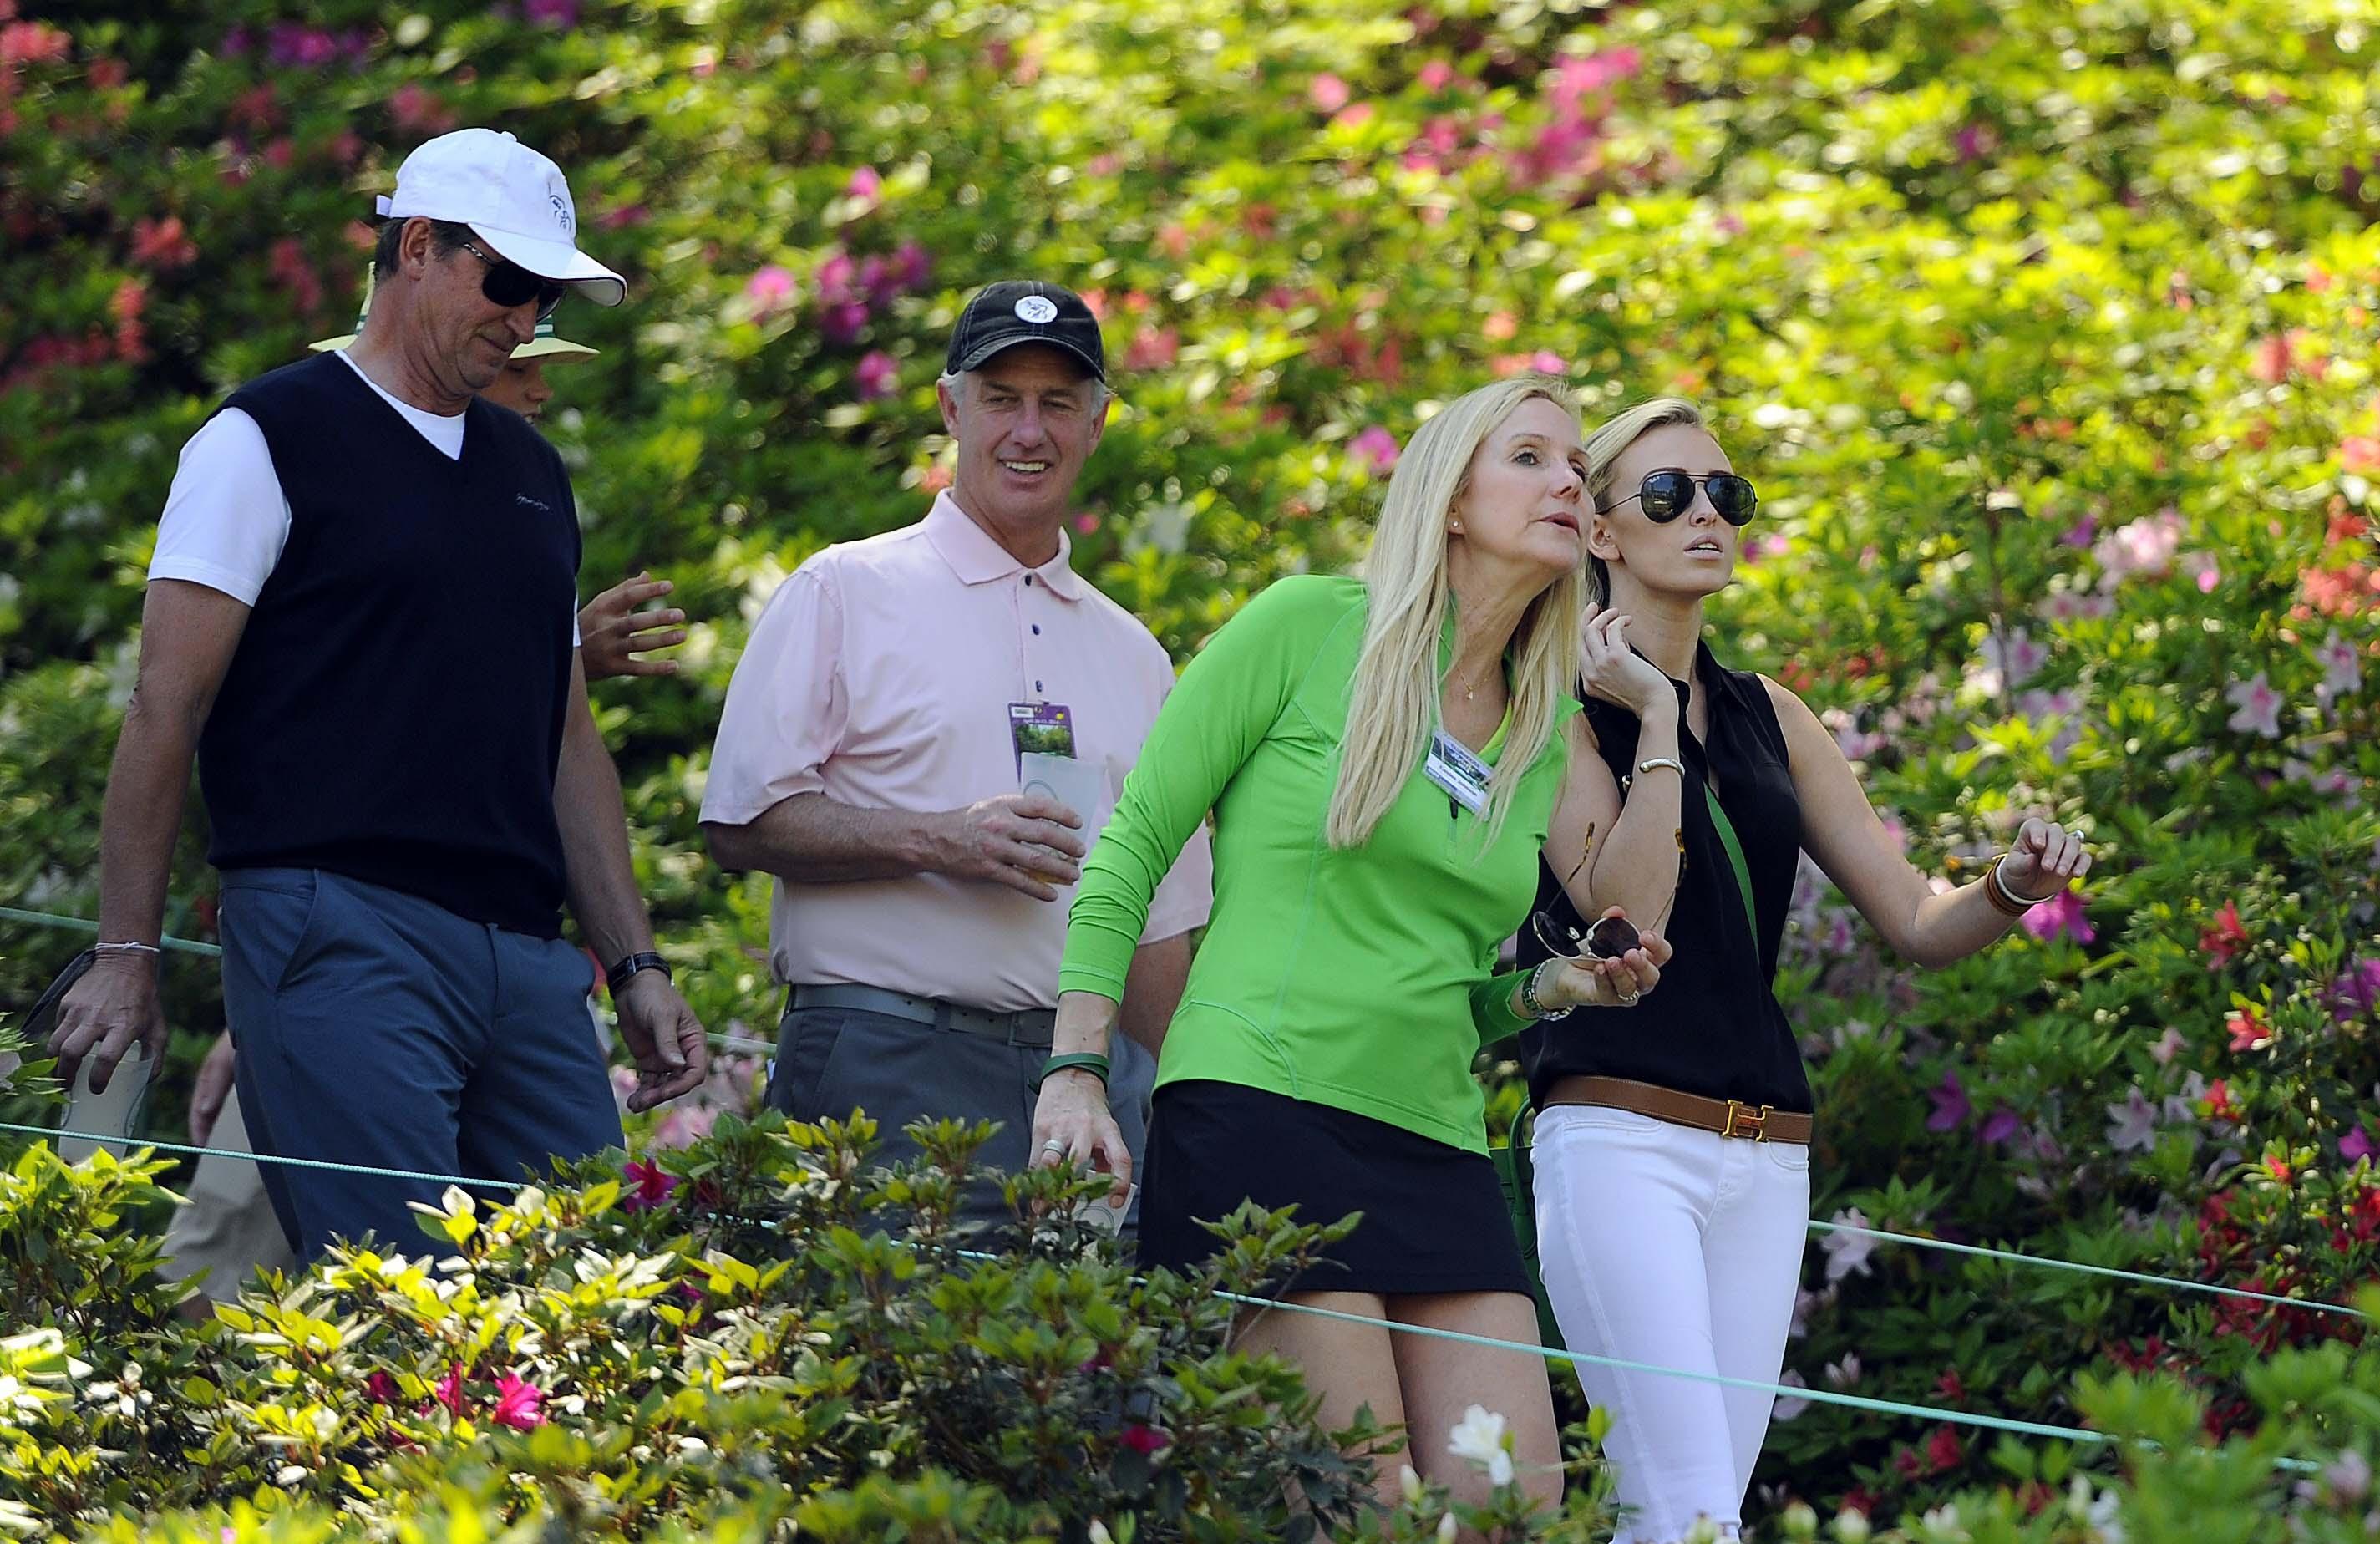 Wayne and Paulina Gretzky